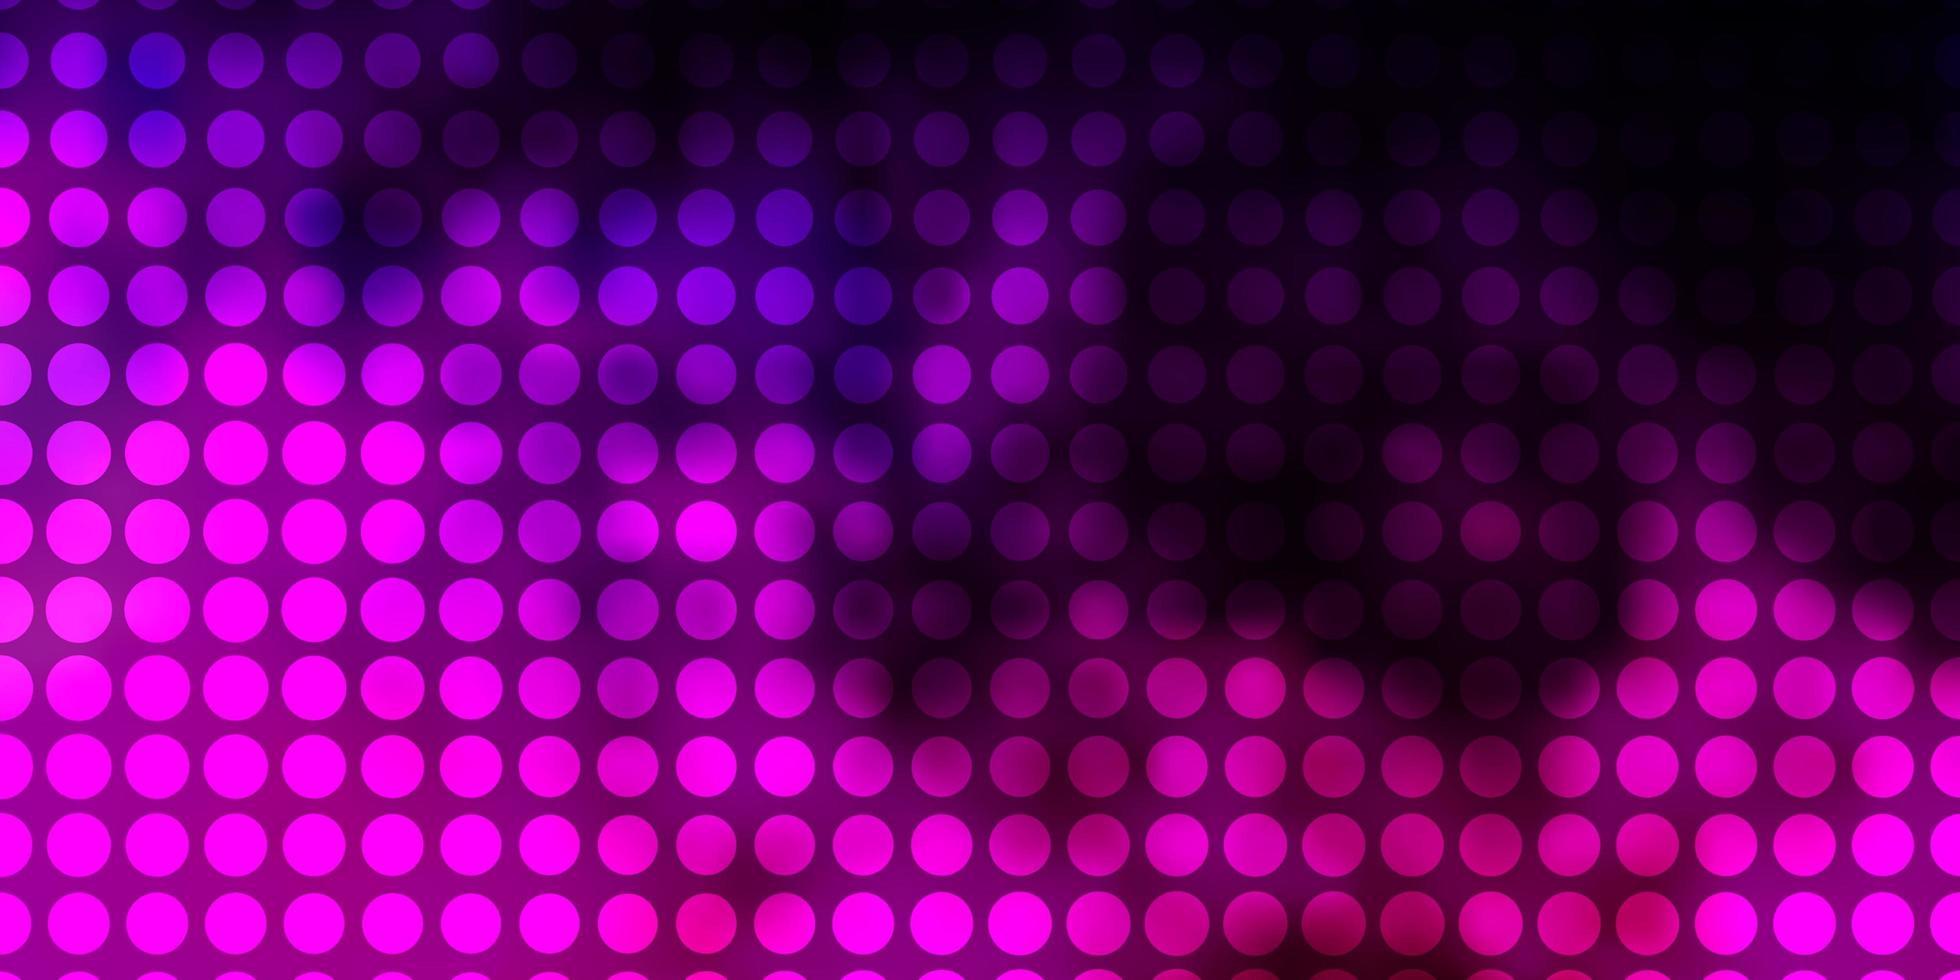 dunkelviolette, rosa Vektorschablone mit Kreisen. vektor